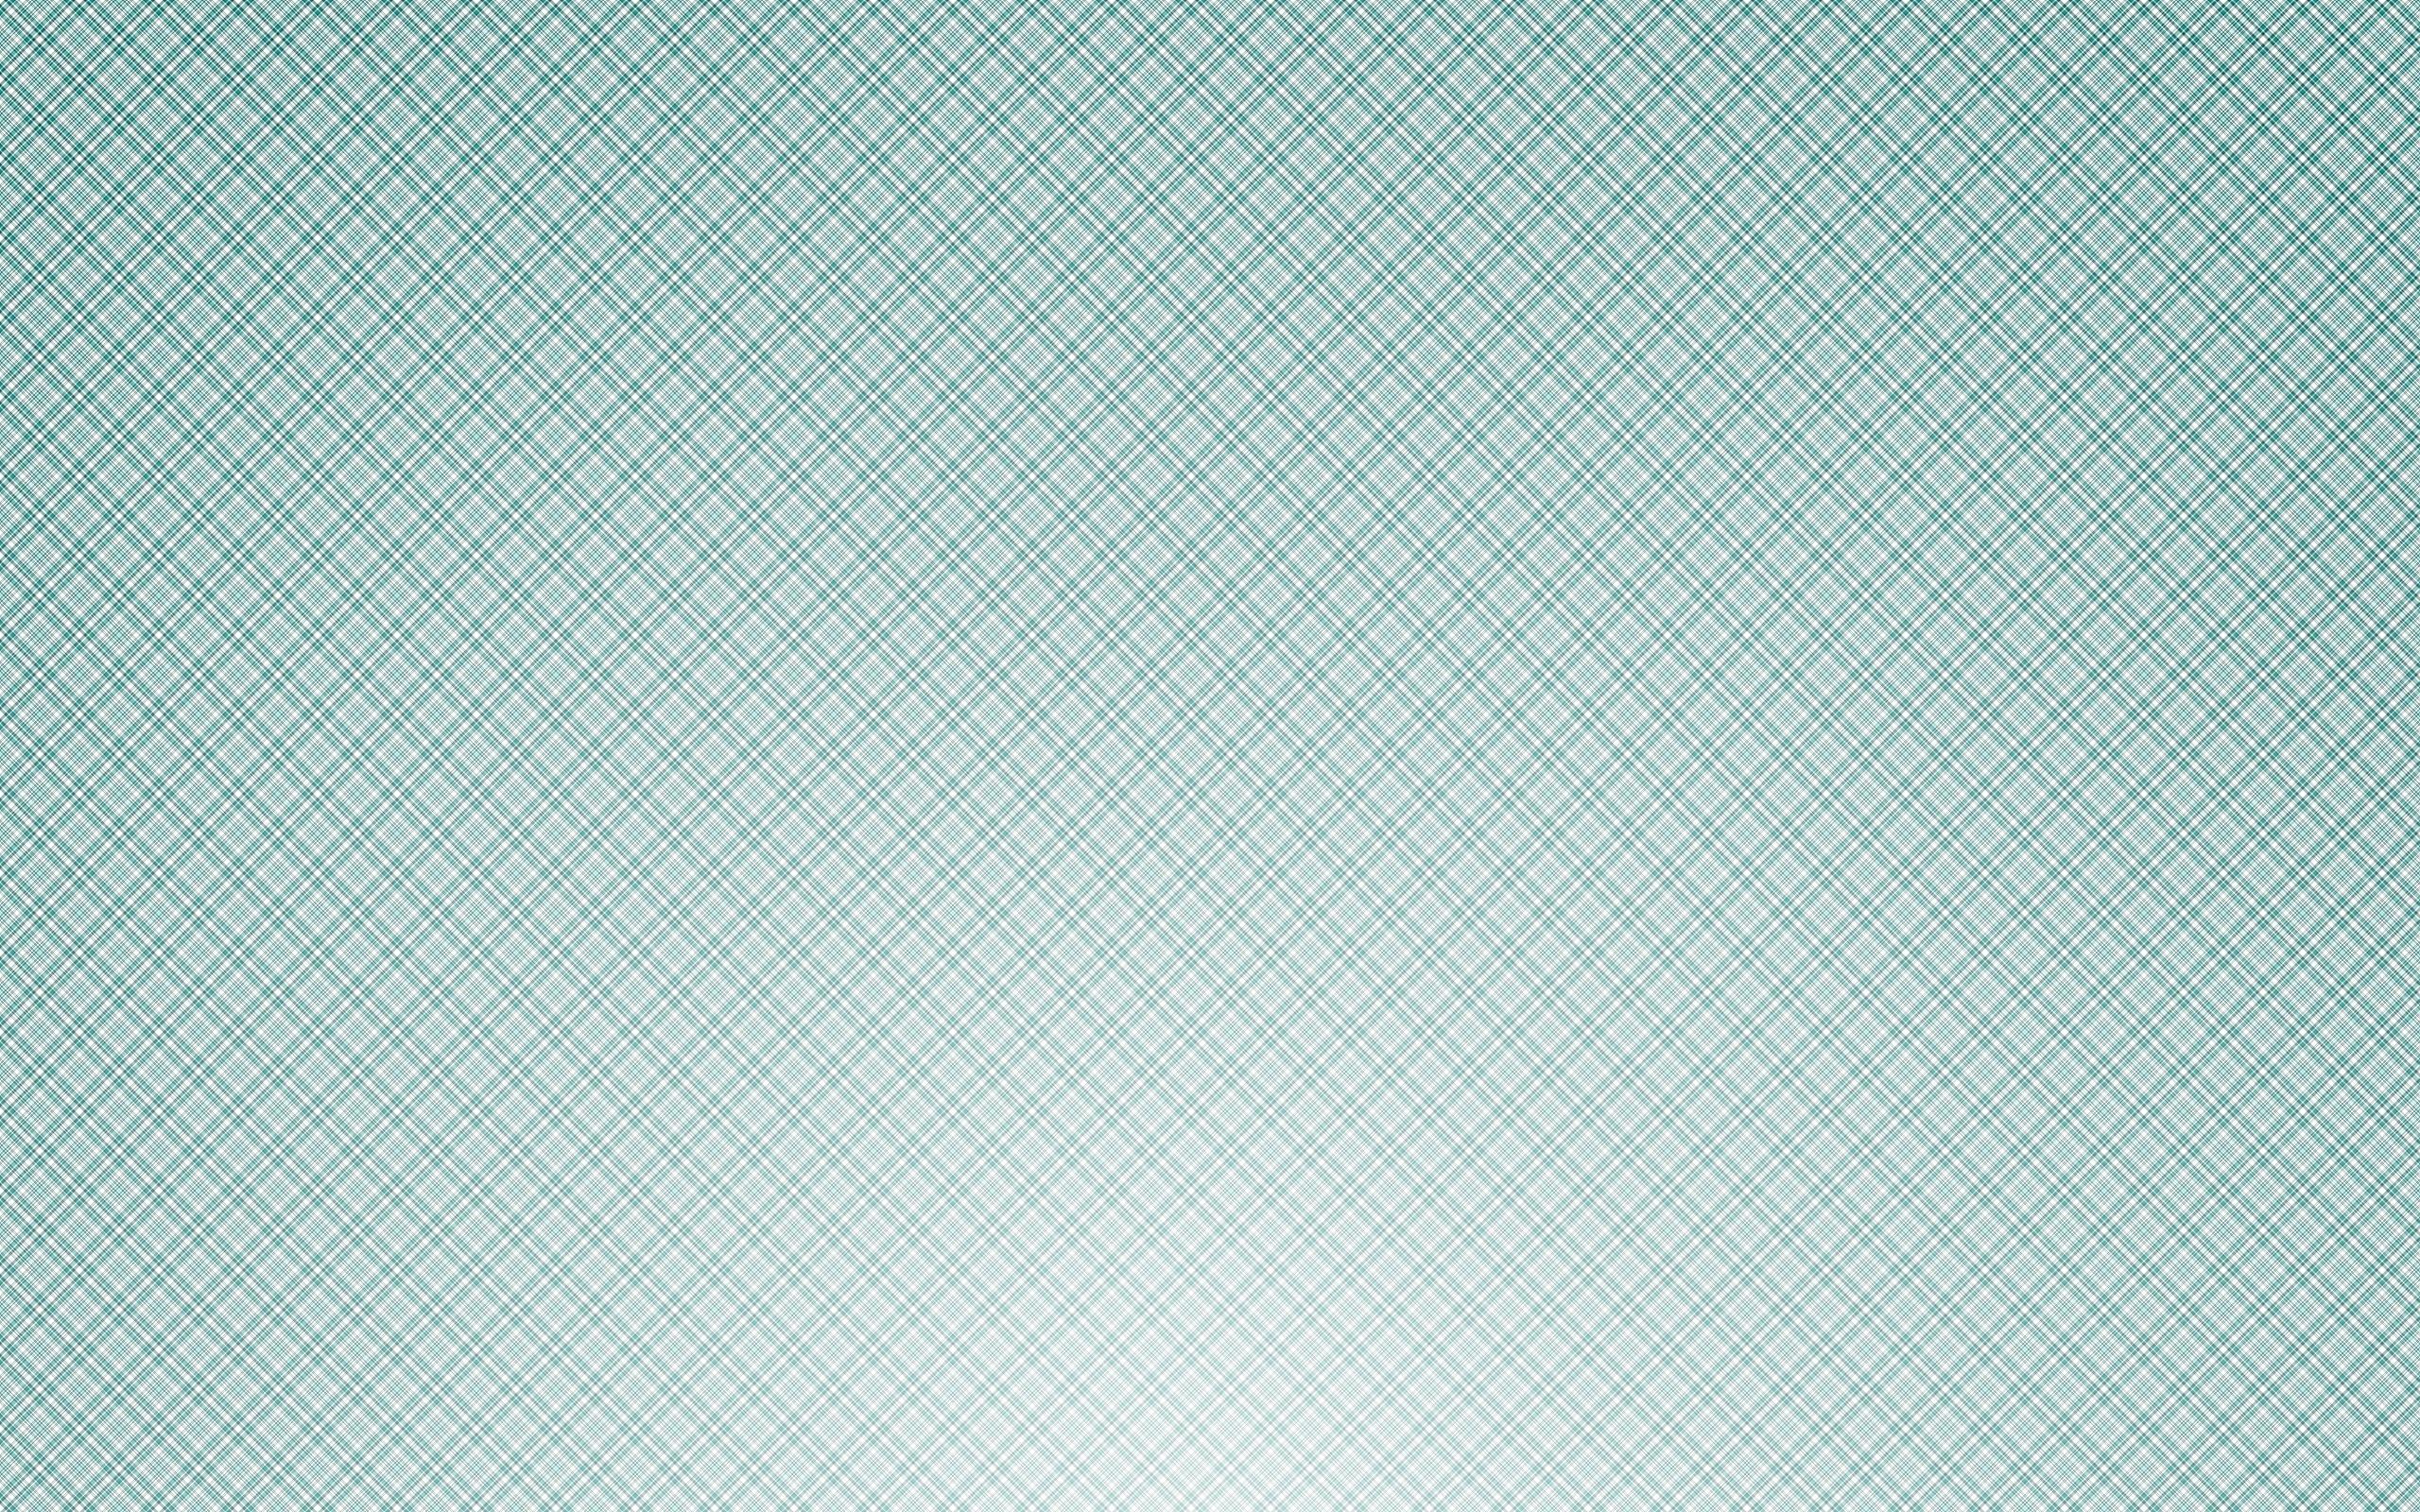 Free Pattern Backgrounds 18345 2560x1600 Px Hdwallsource Com